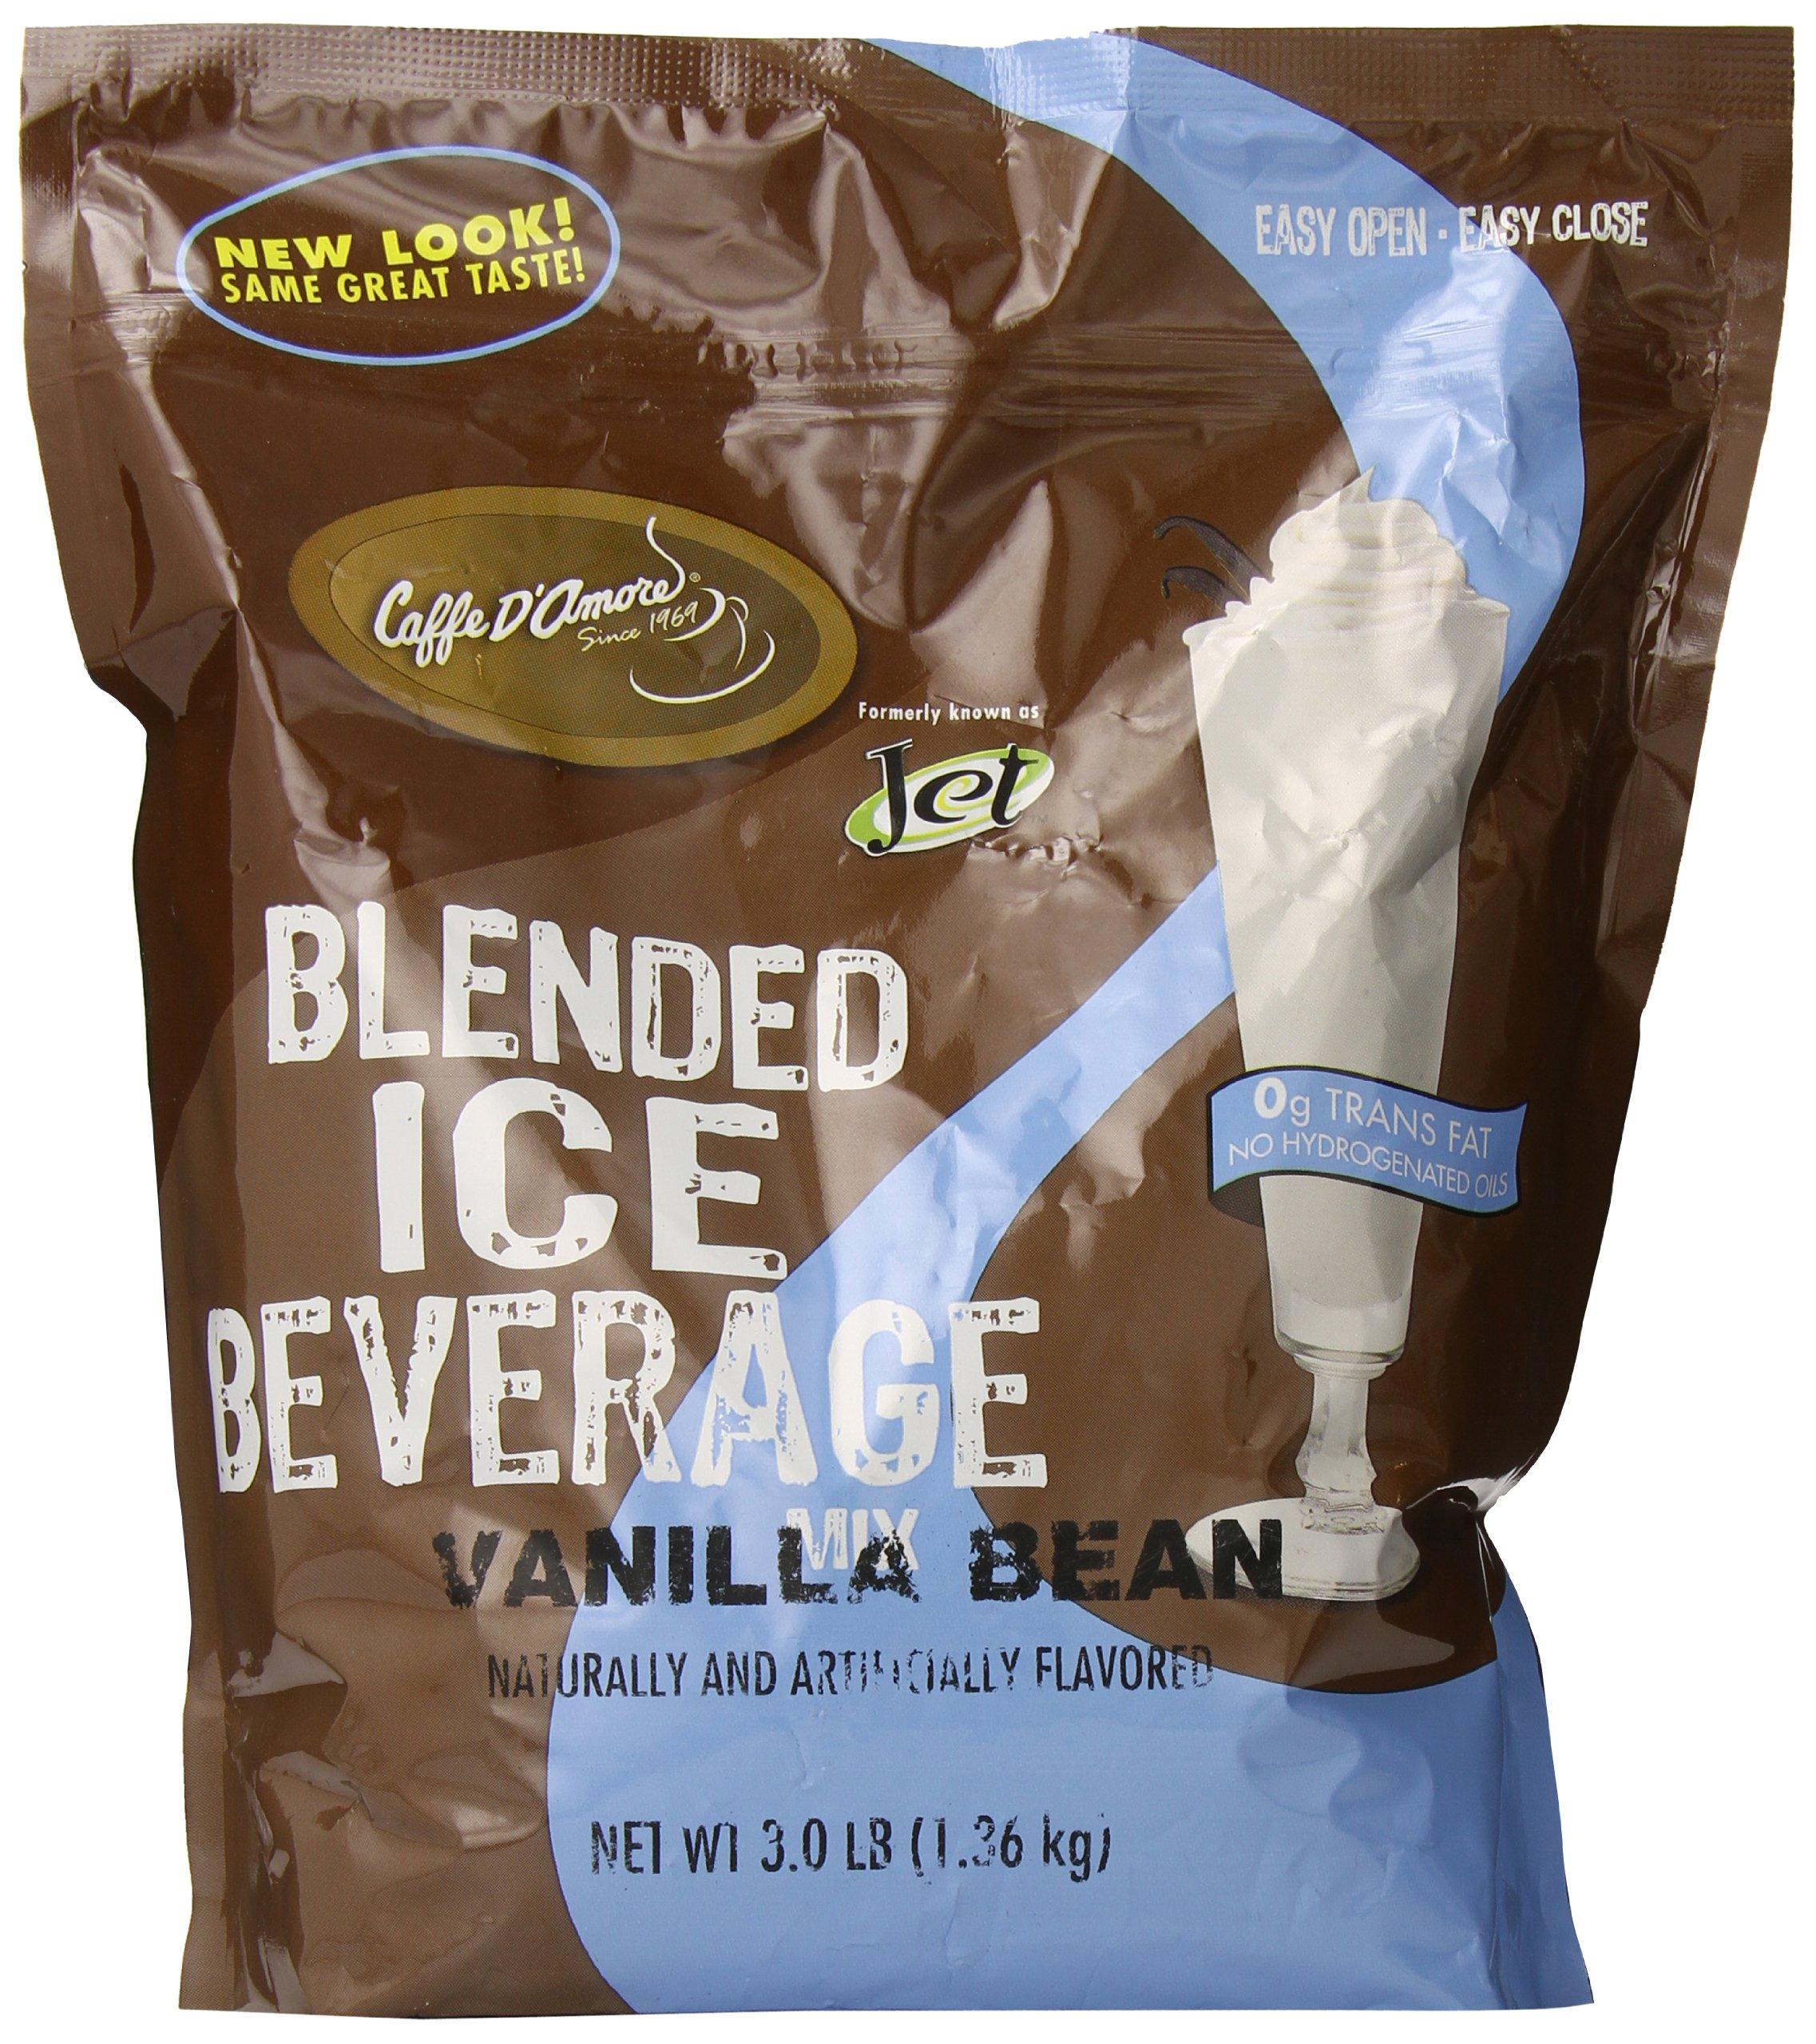 DaVinci Blended Ice Beverage, Vanilla Bean, 3 Pound Bag